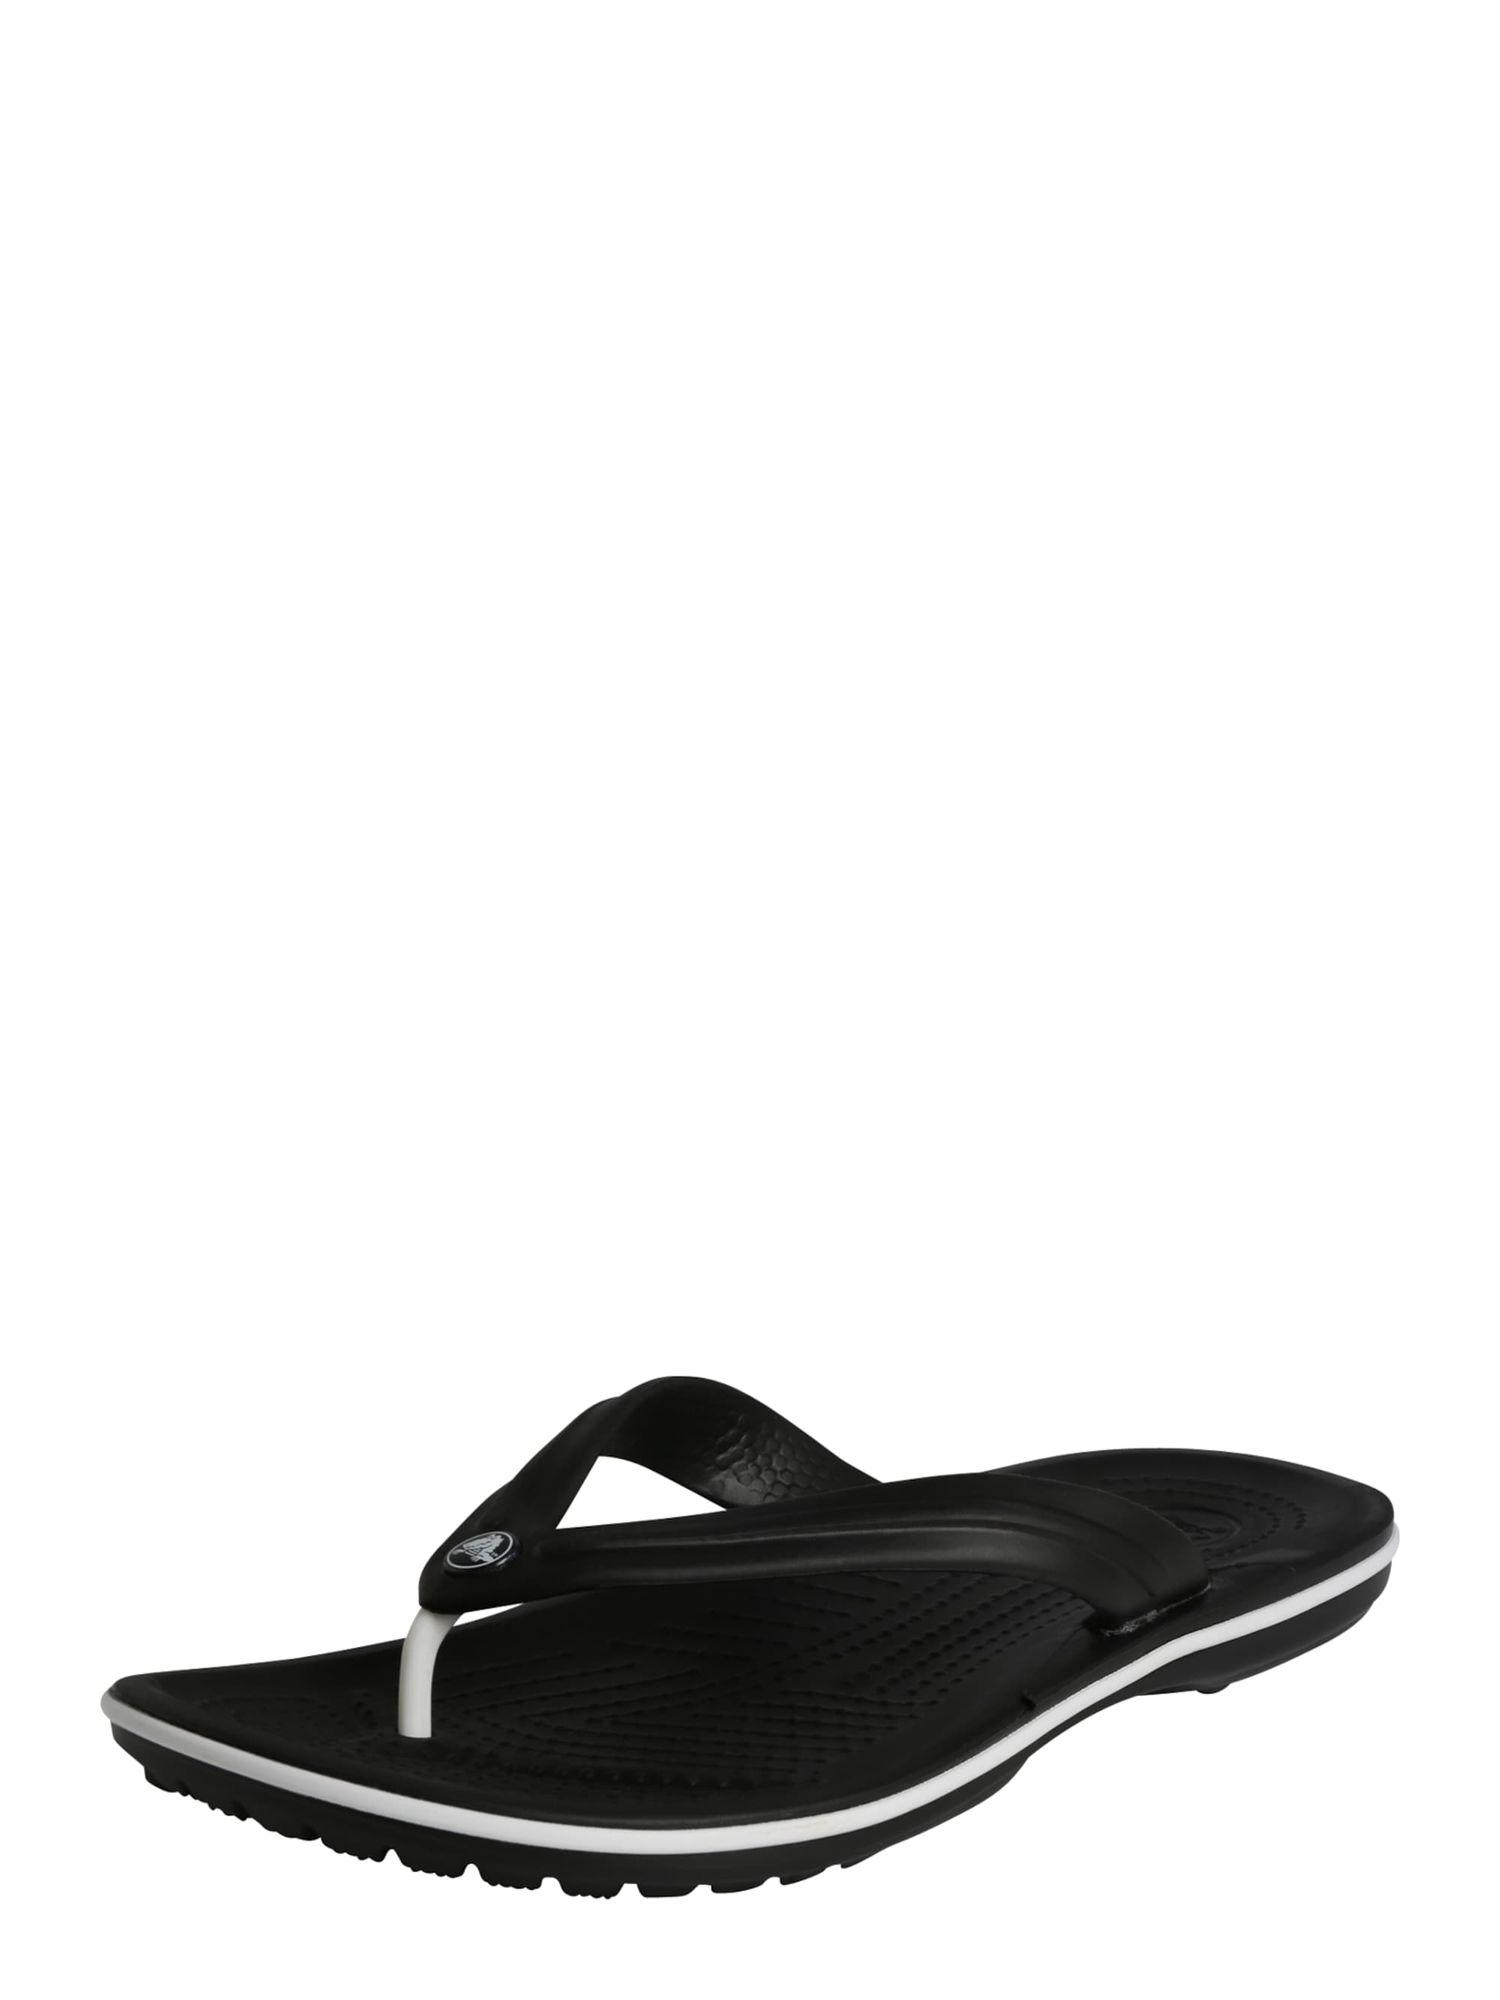 Sandale ´Crocband Flip M´